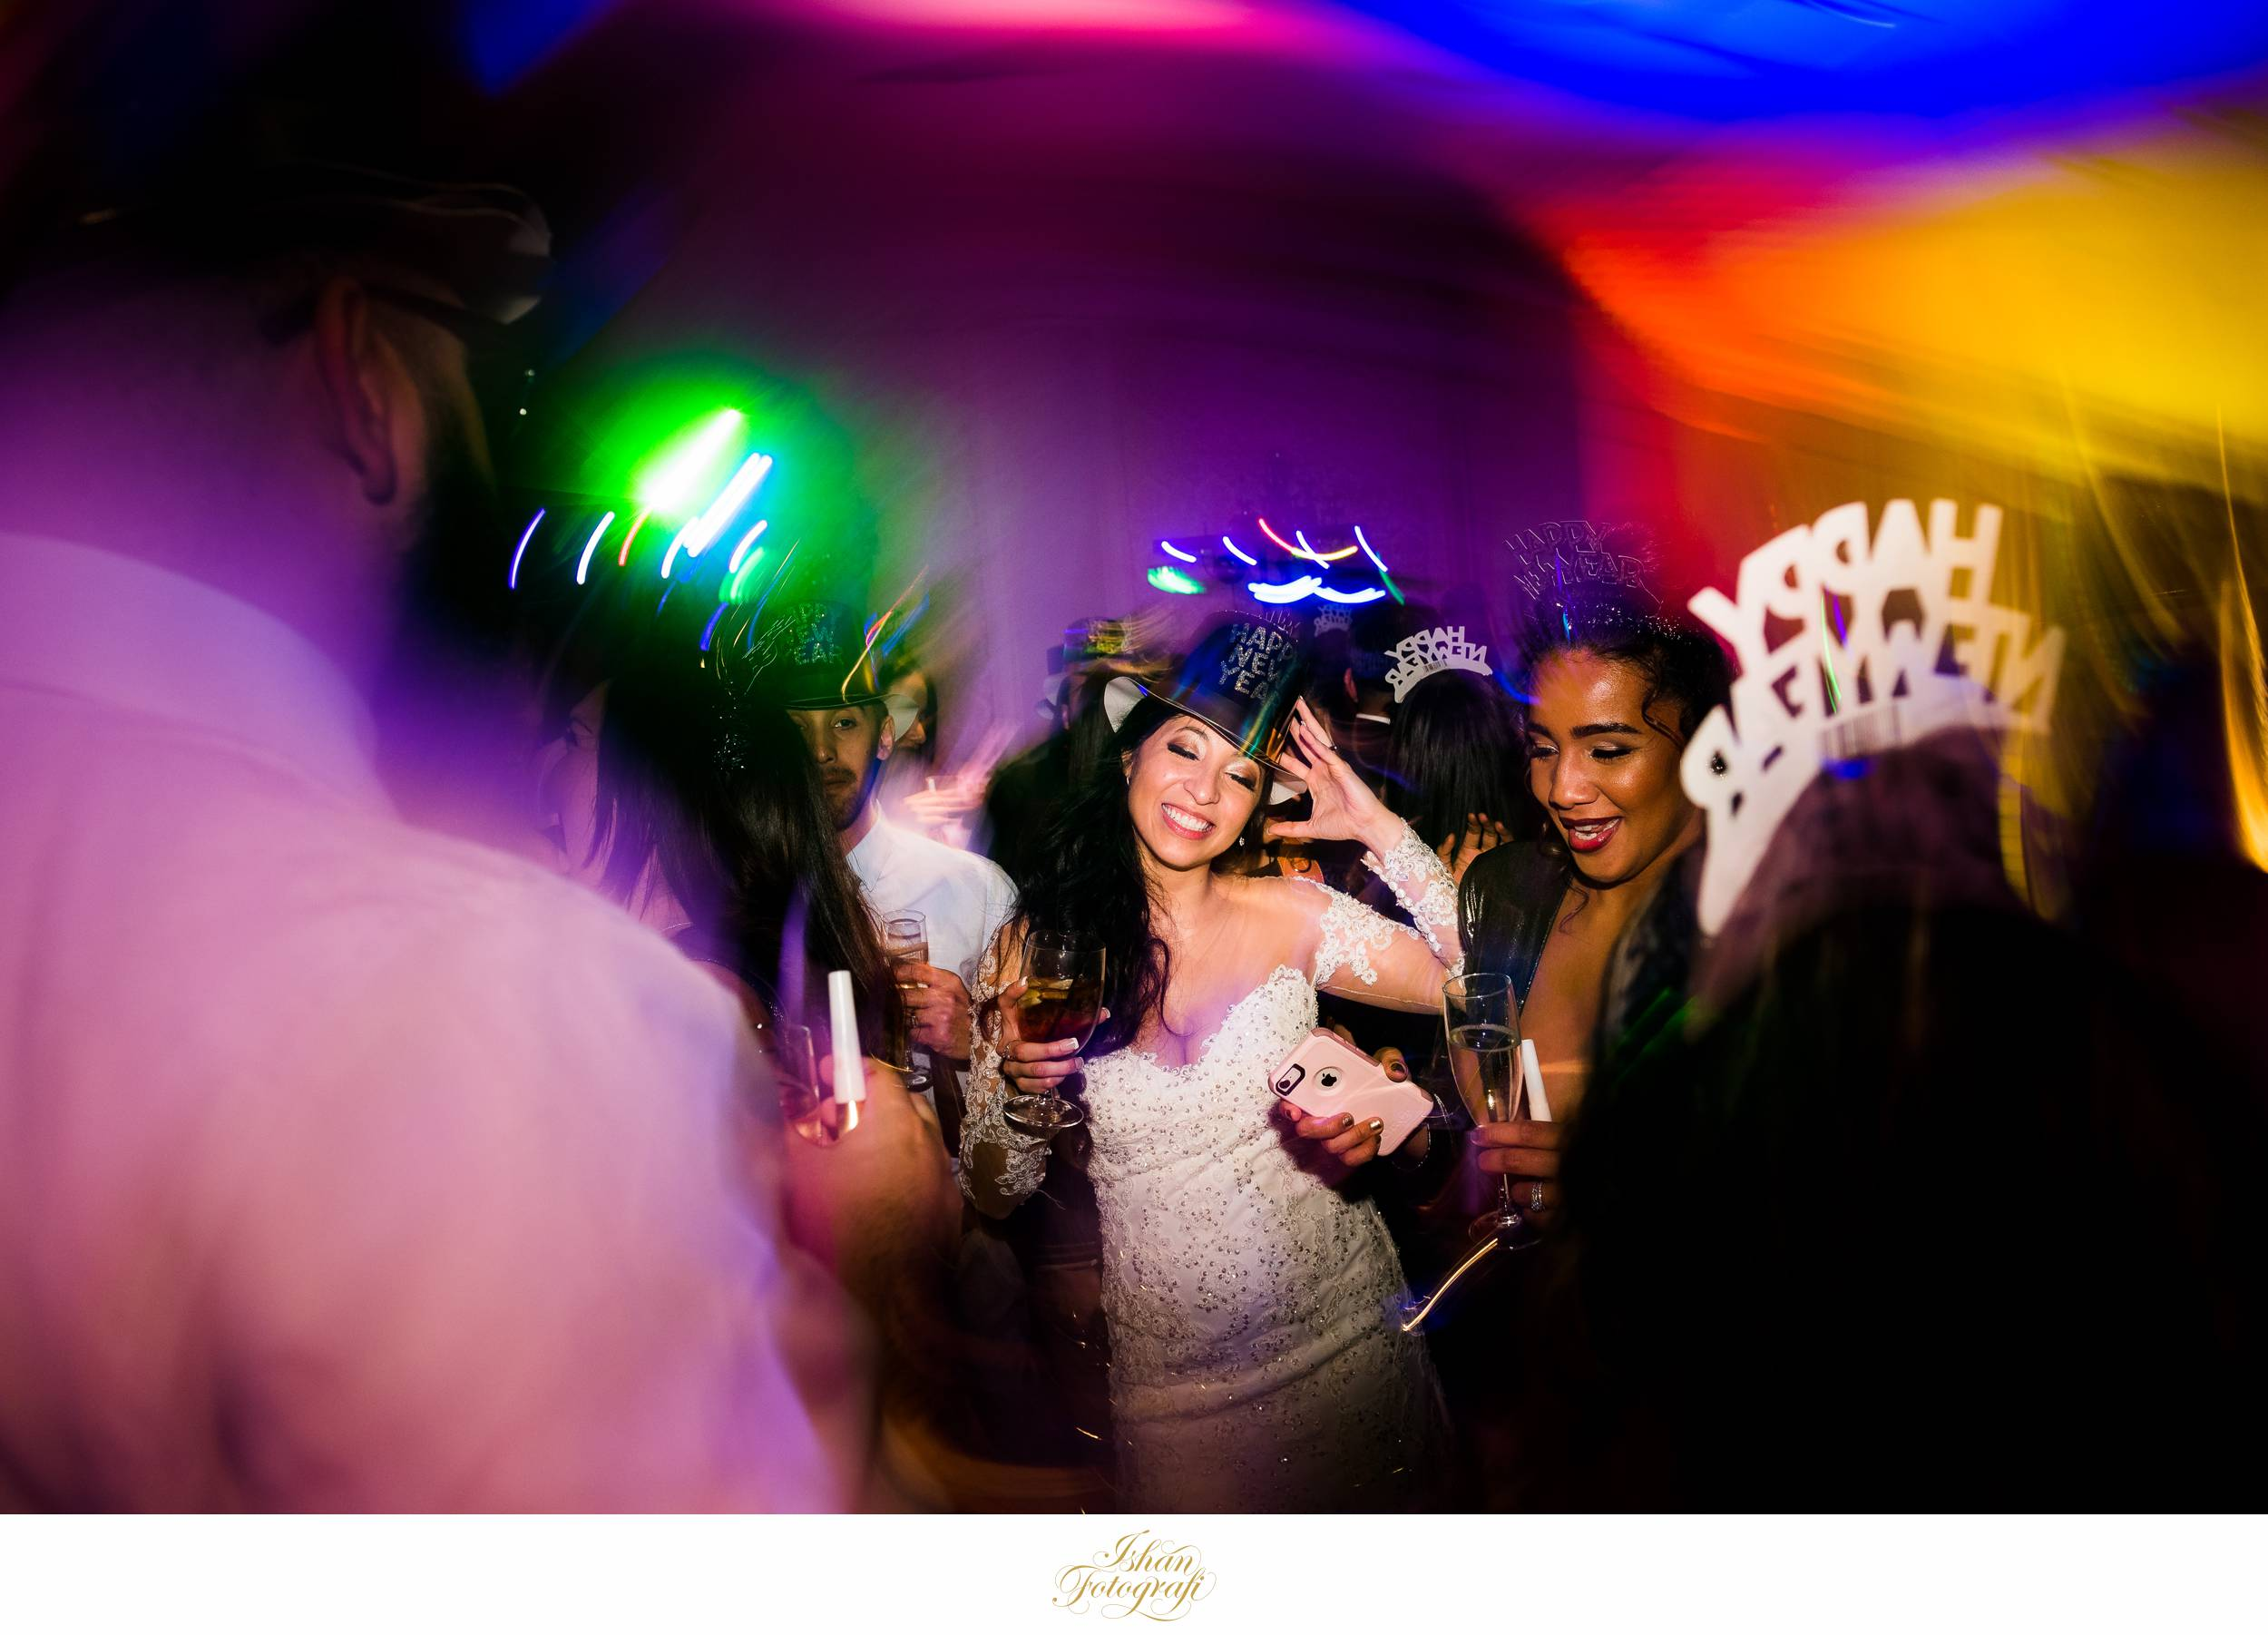 new-years-eve-wedding-reception-meadow-wood-manor